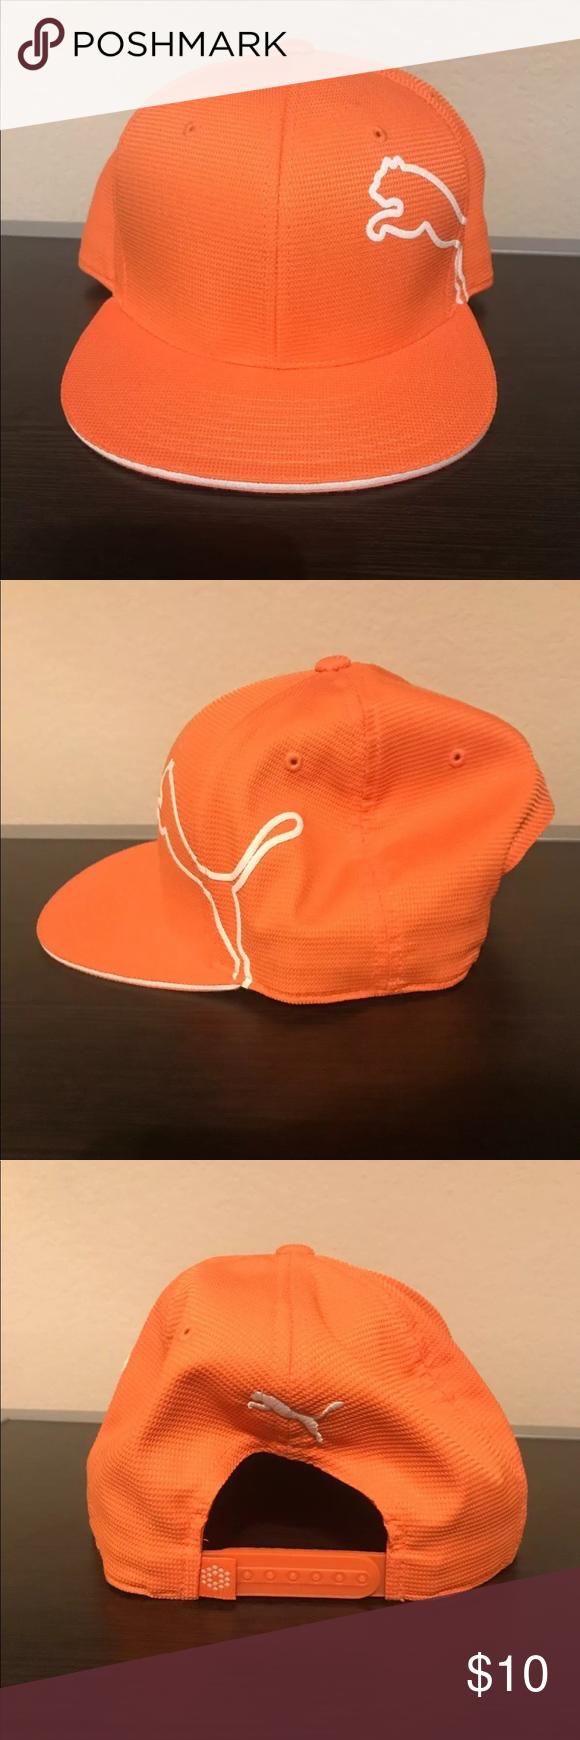 f8b7bfceb2f ... hurricane golf ba152 e091a closeout mens puma monoline snapback golf  hat puma snapback monoline golf hat in vibrant orange just ...